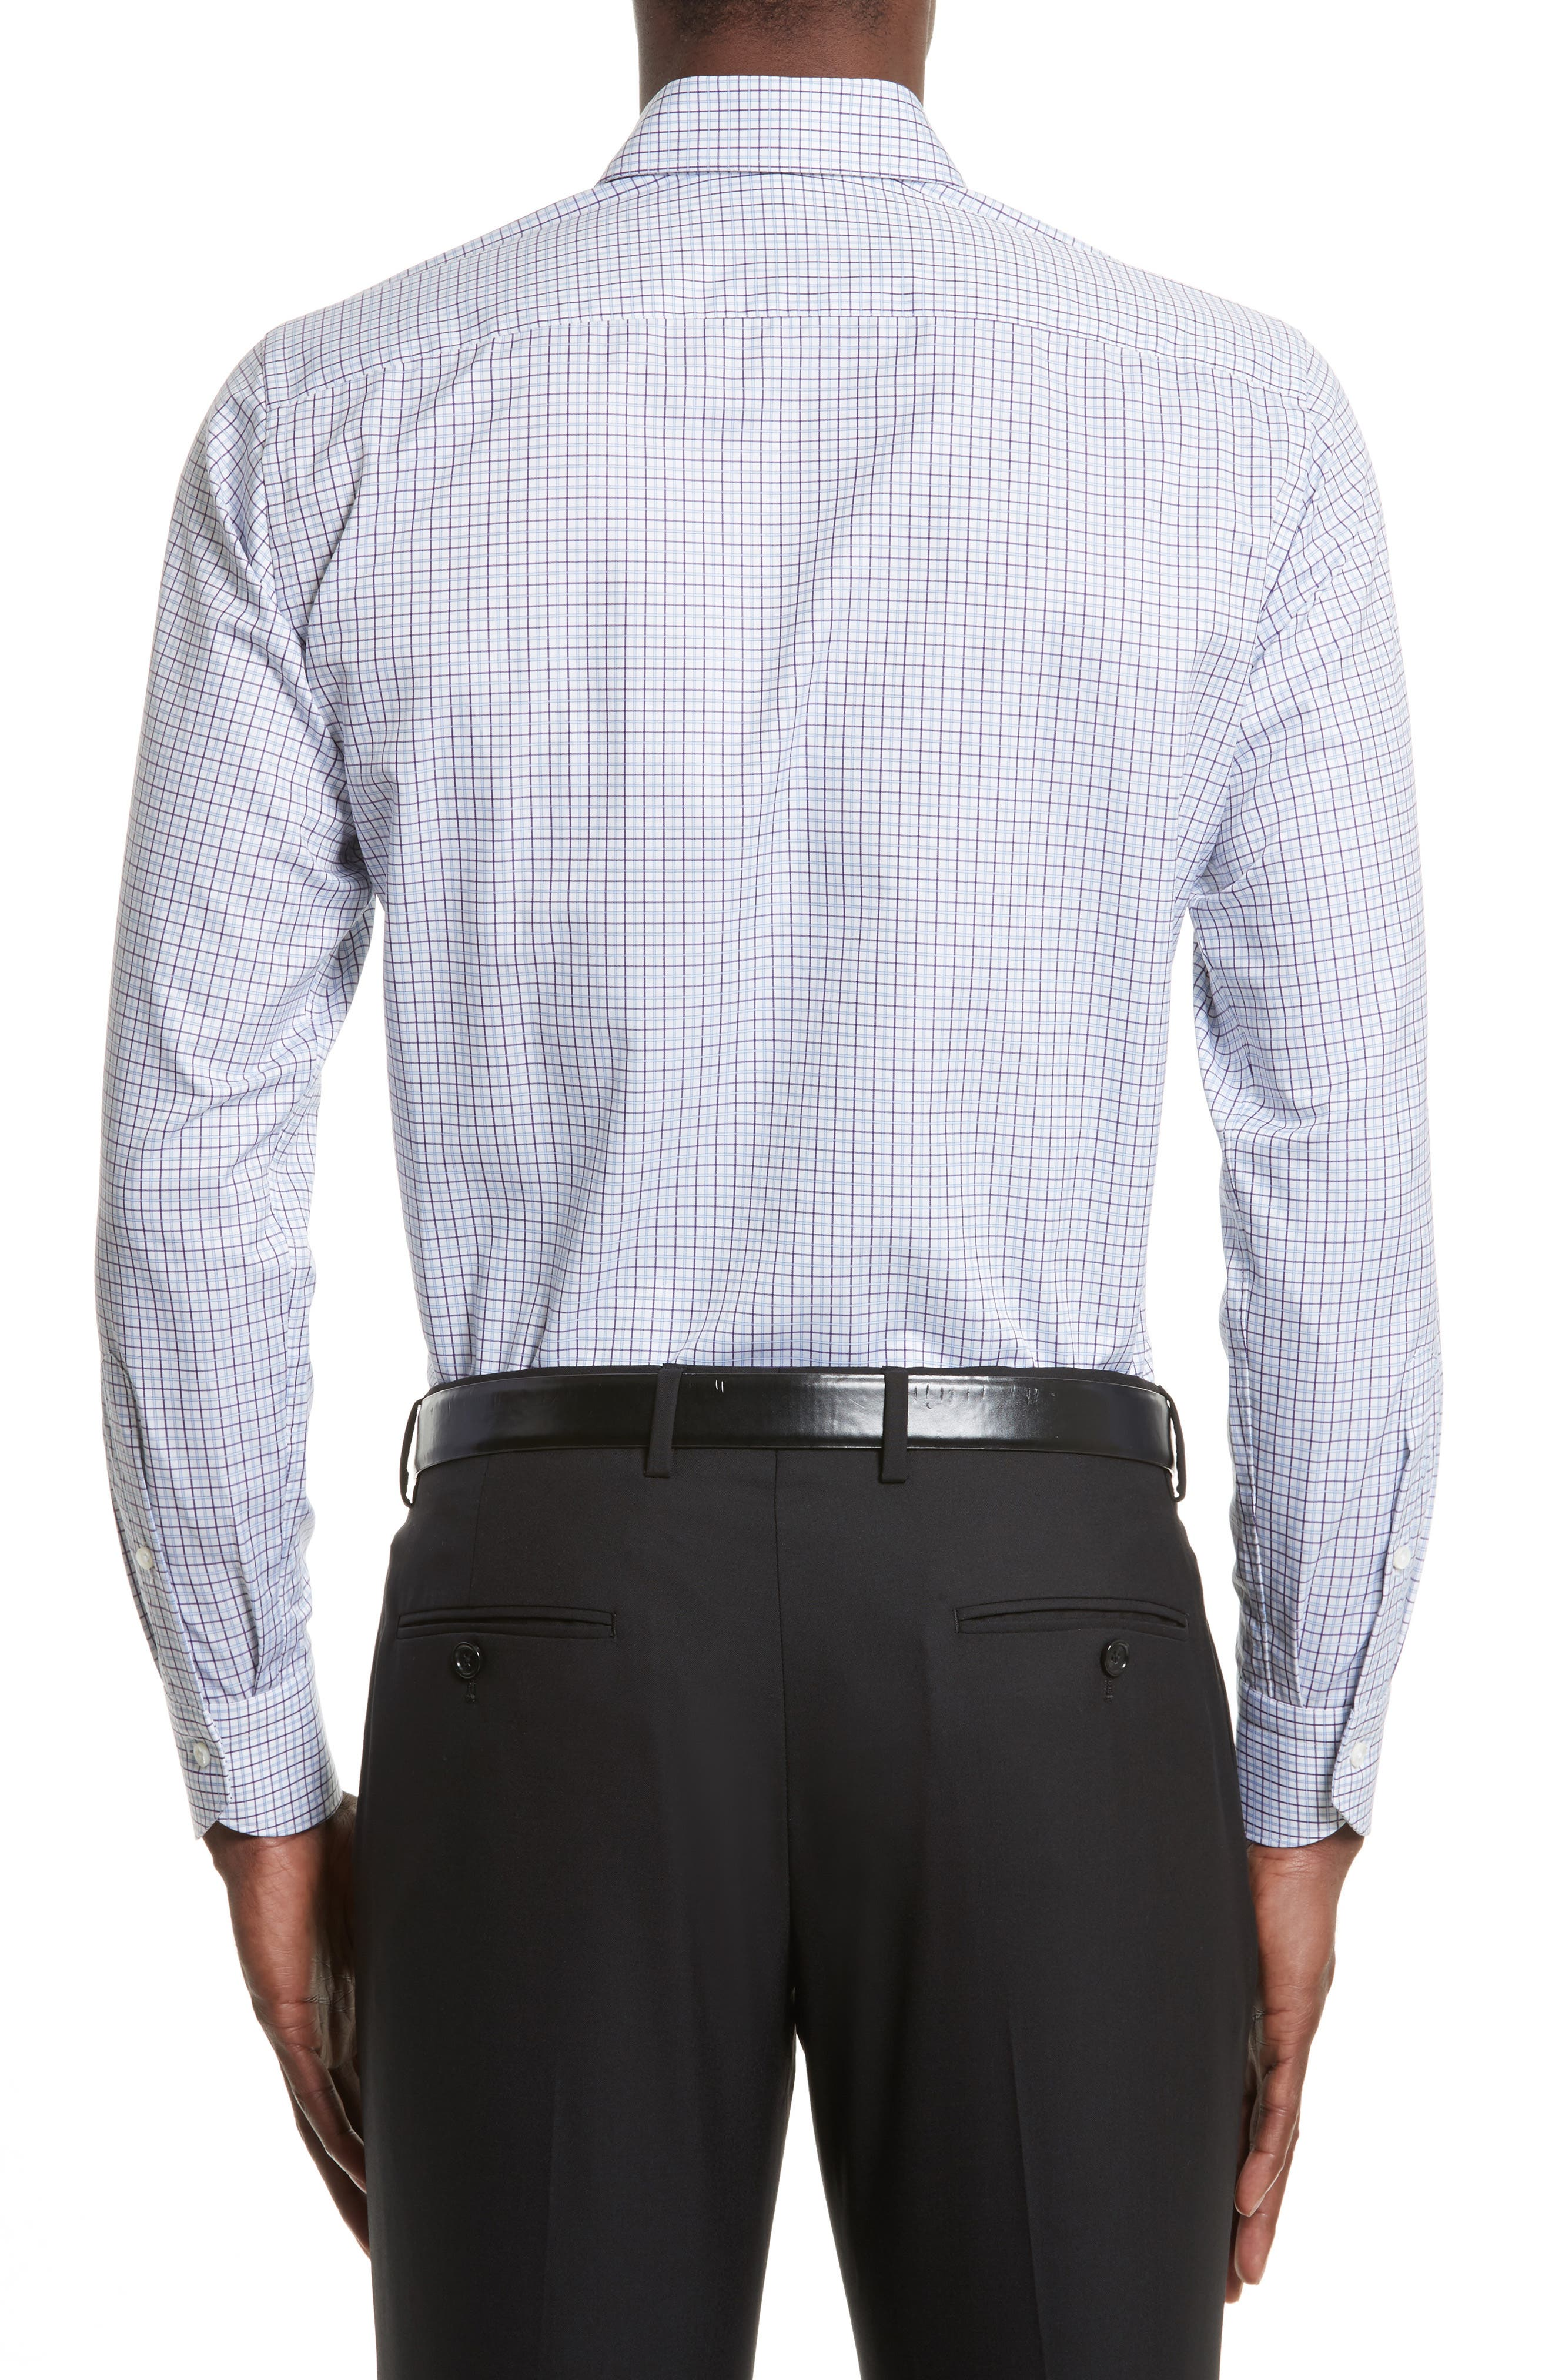 Regular Fit Check Dress Shirt,                             Alternate thumbnail 3, color,                             Purple